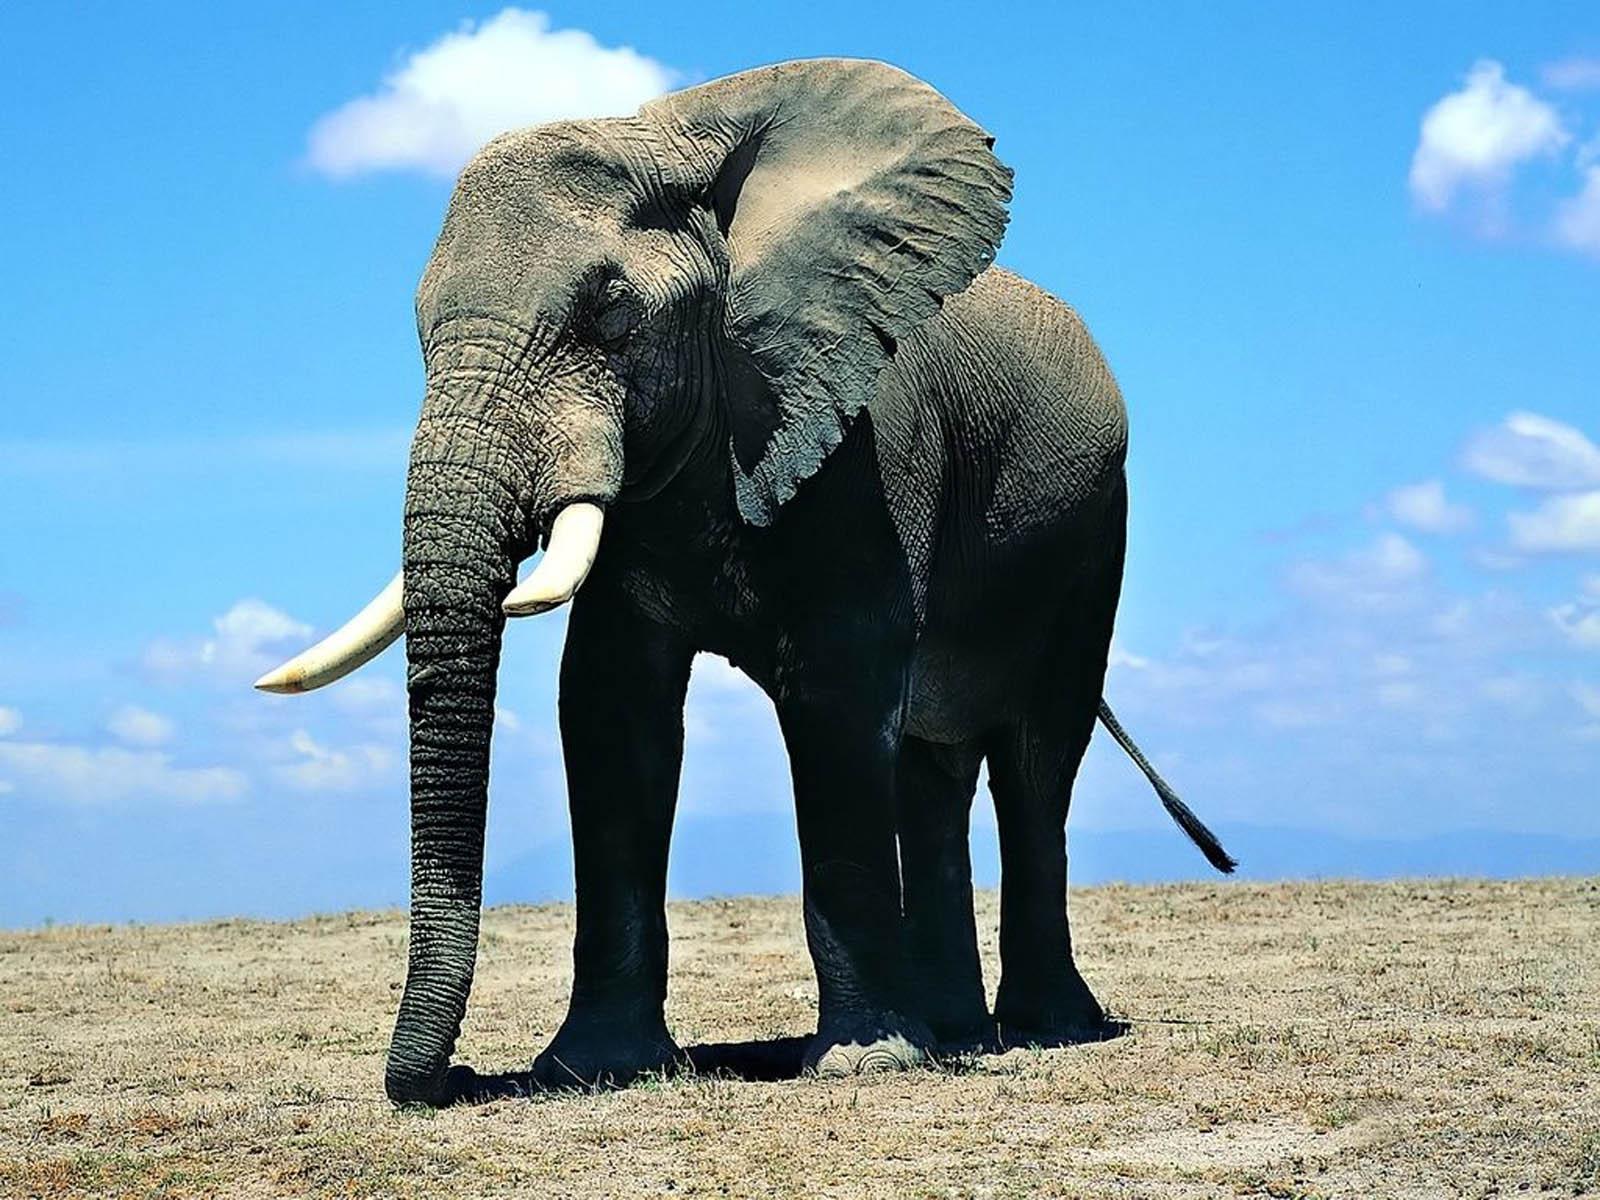 Wallpaper Elephant Wallpapers